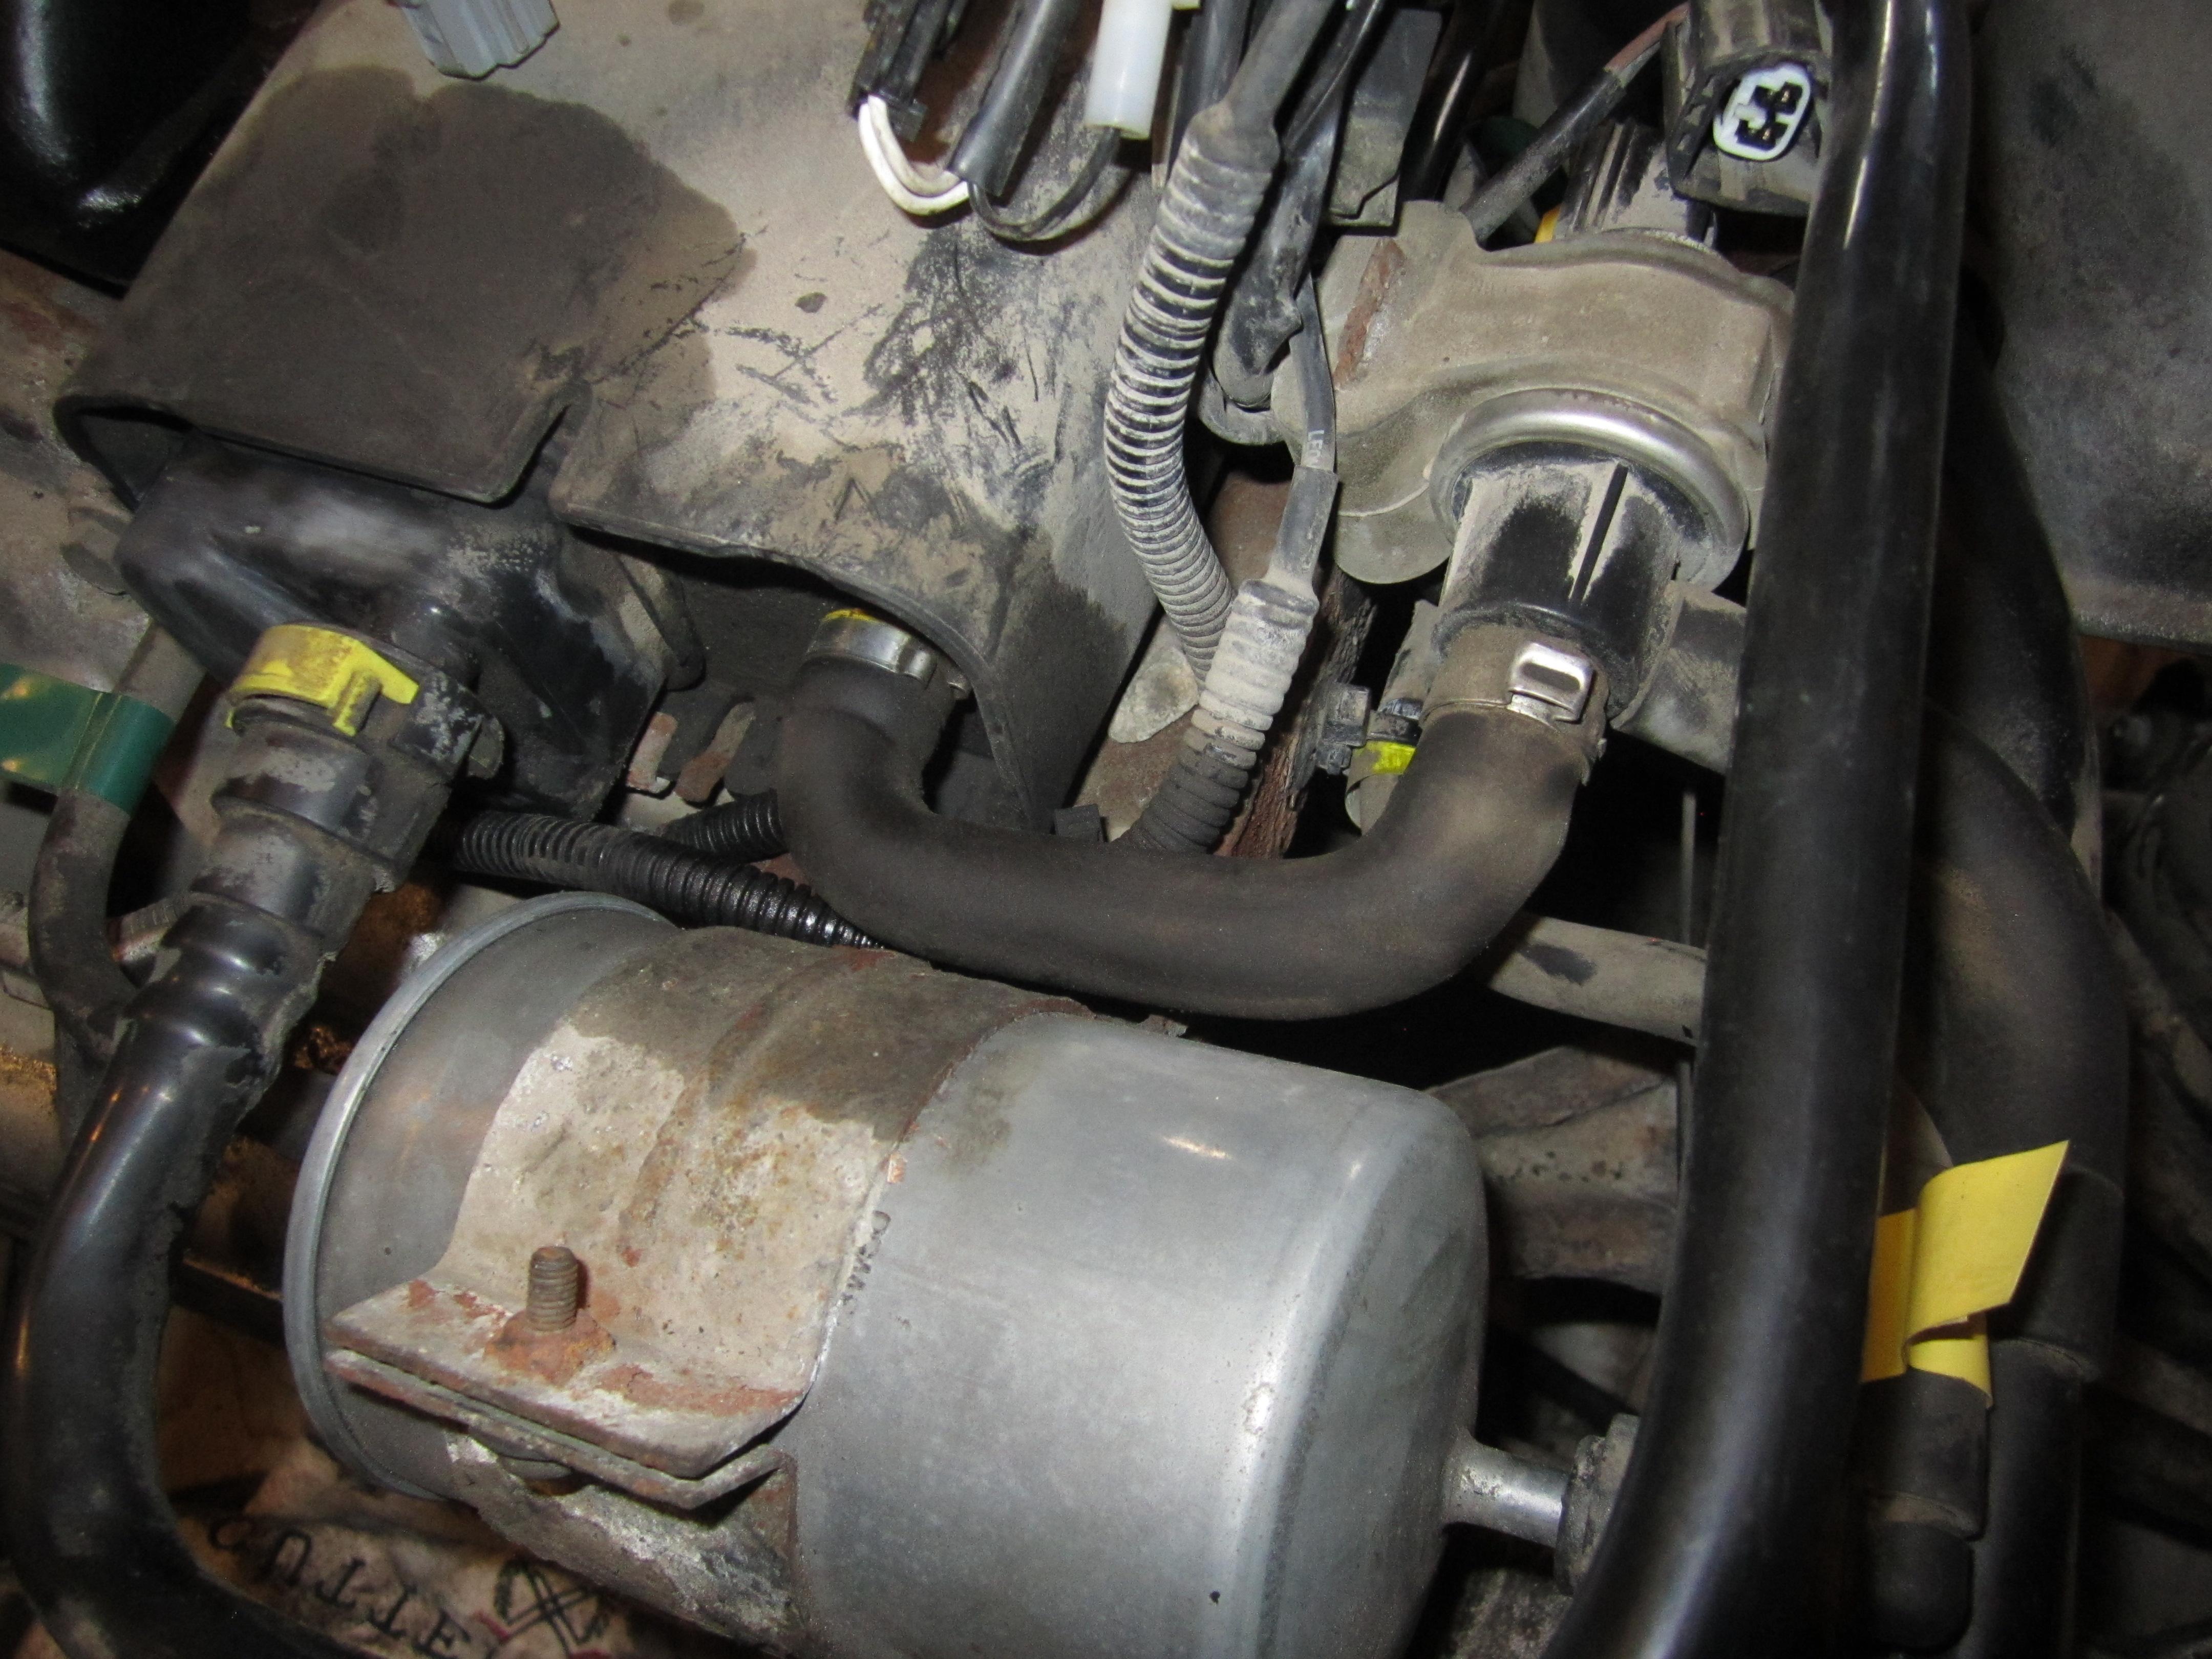 [DIAGRAM_1CA]  1998 Volvo V70 Fuel Filter - ktm.suspention7.kurvenkratzer-touren.de   Volvo S60 Fuel Filter Location      kurvenkratzer-touren.de